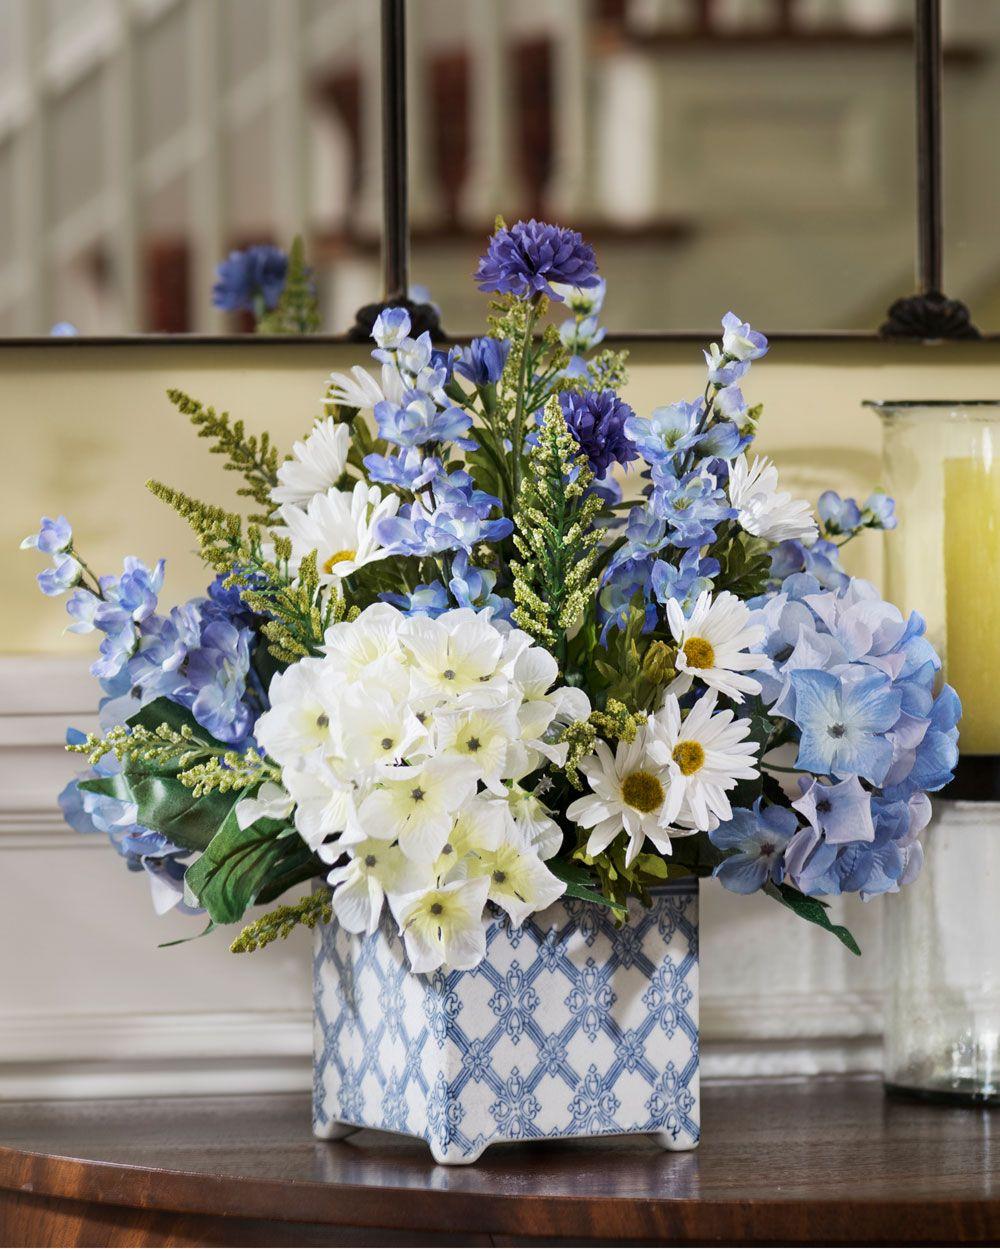 Blue Flower Centerpieces For Weddings: Hydrangeas In Blue Silk Flower Arrangement BLUE